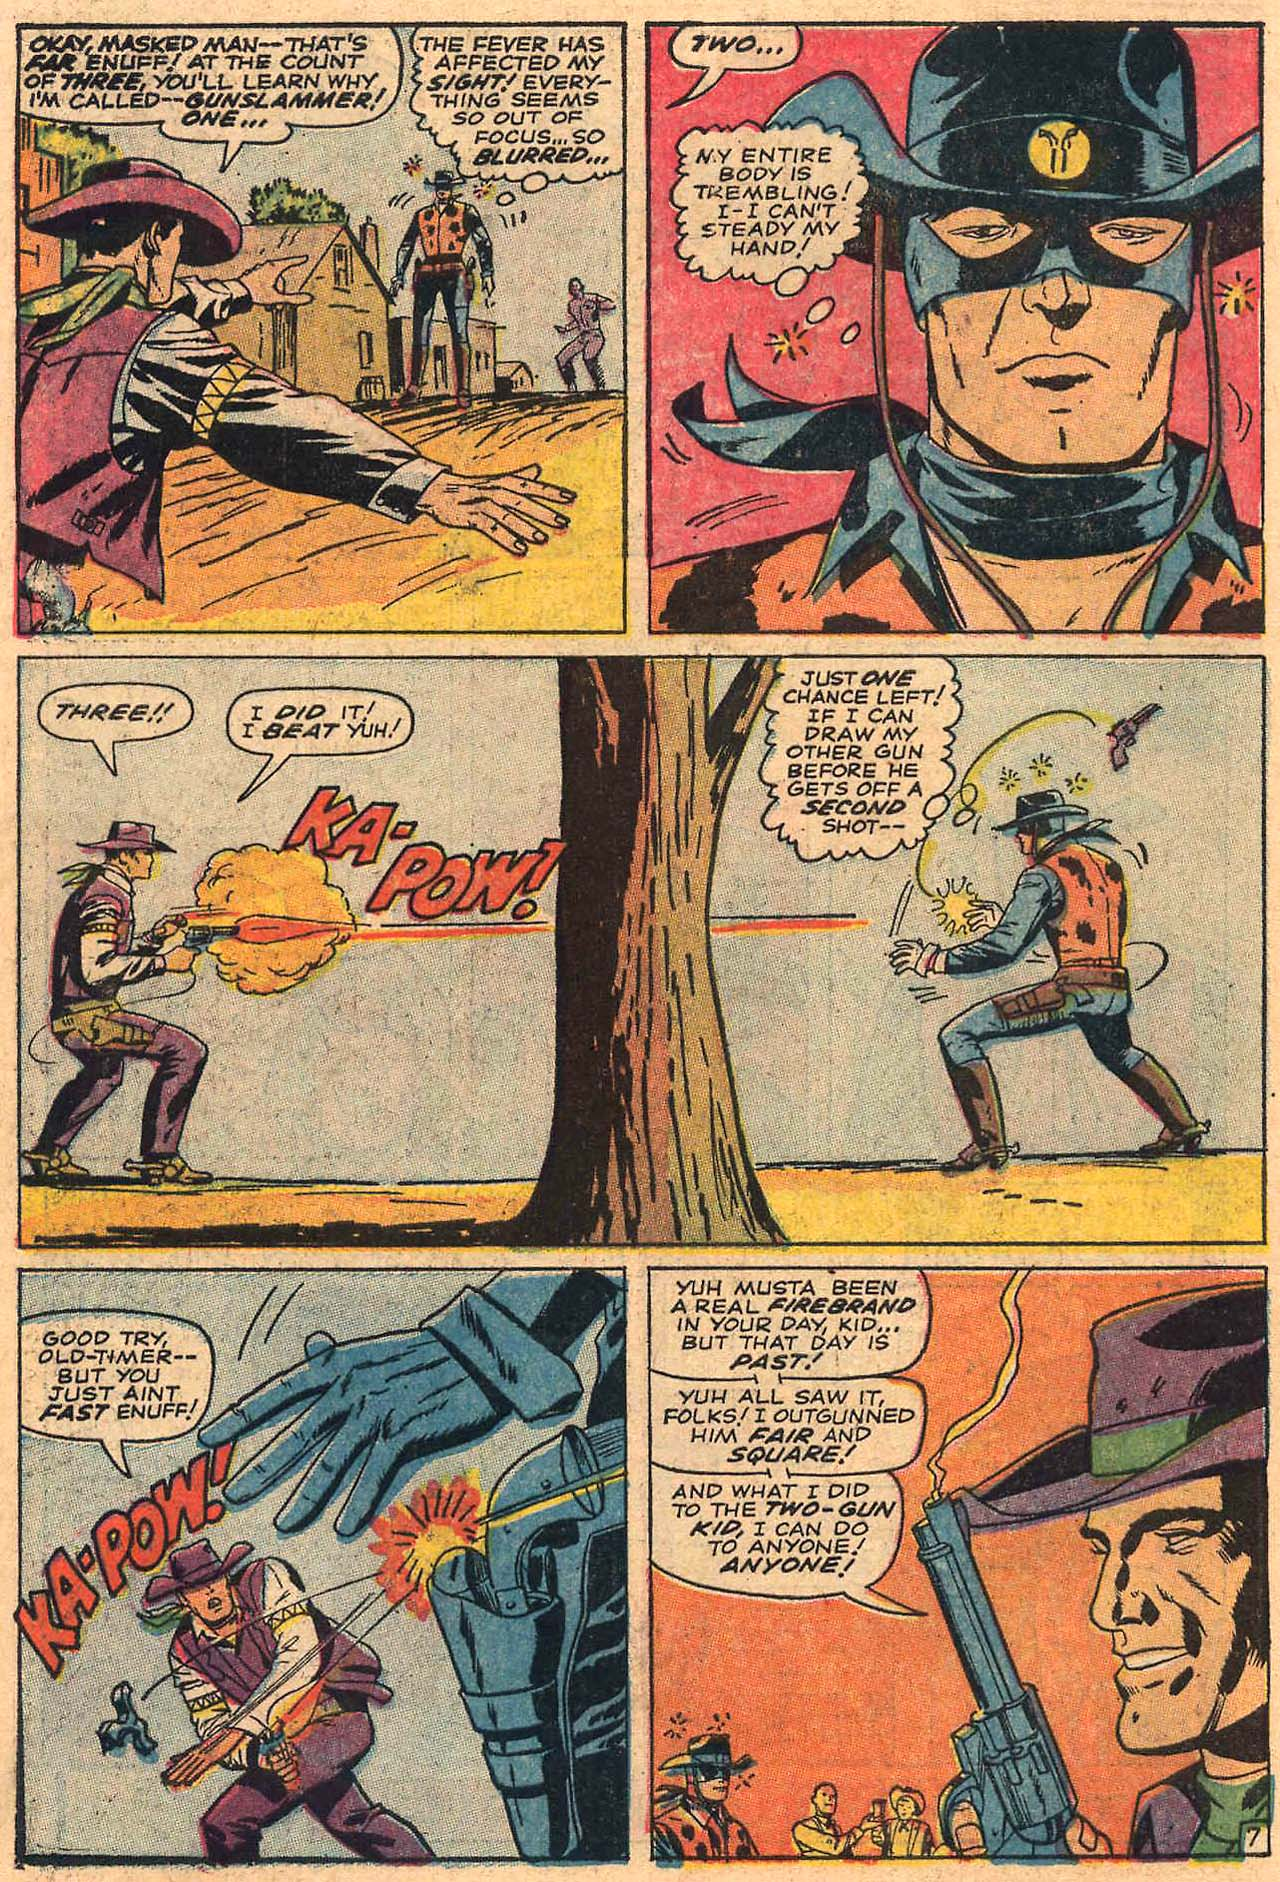 Read online Two-Gun Kid comic -  Issue #84 - 10